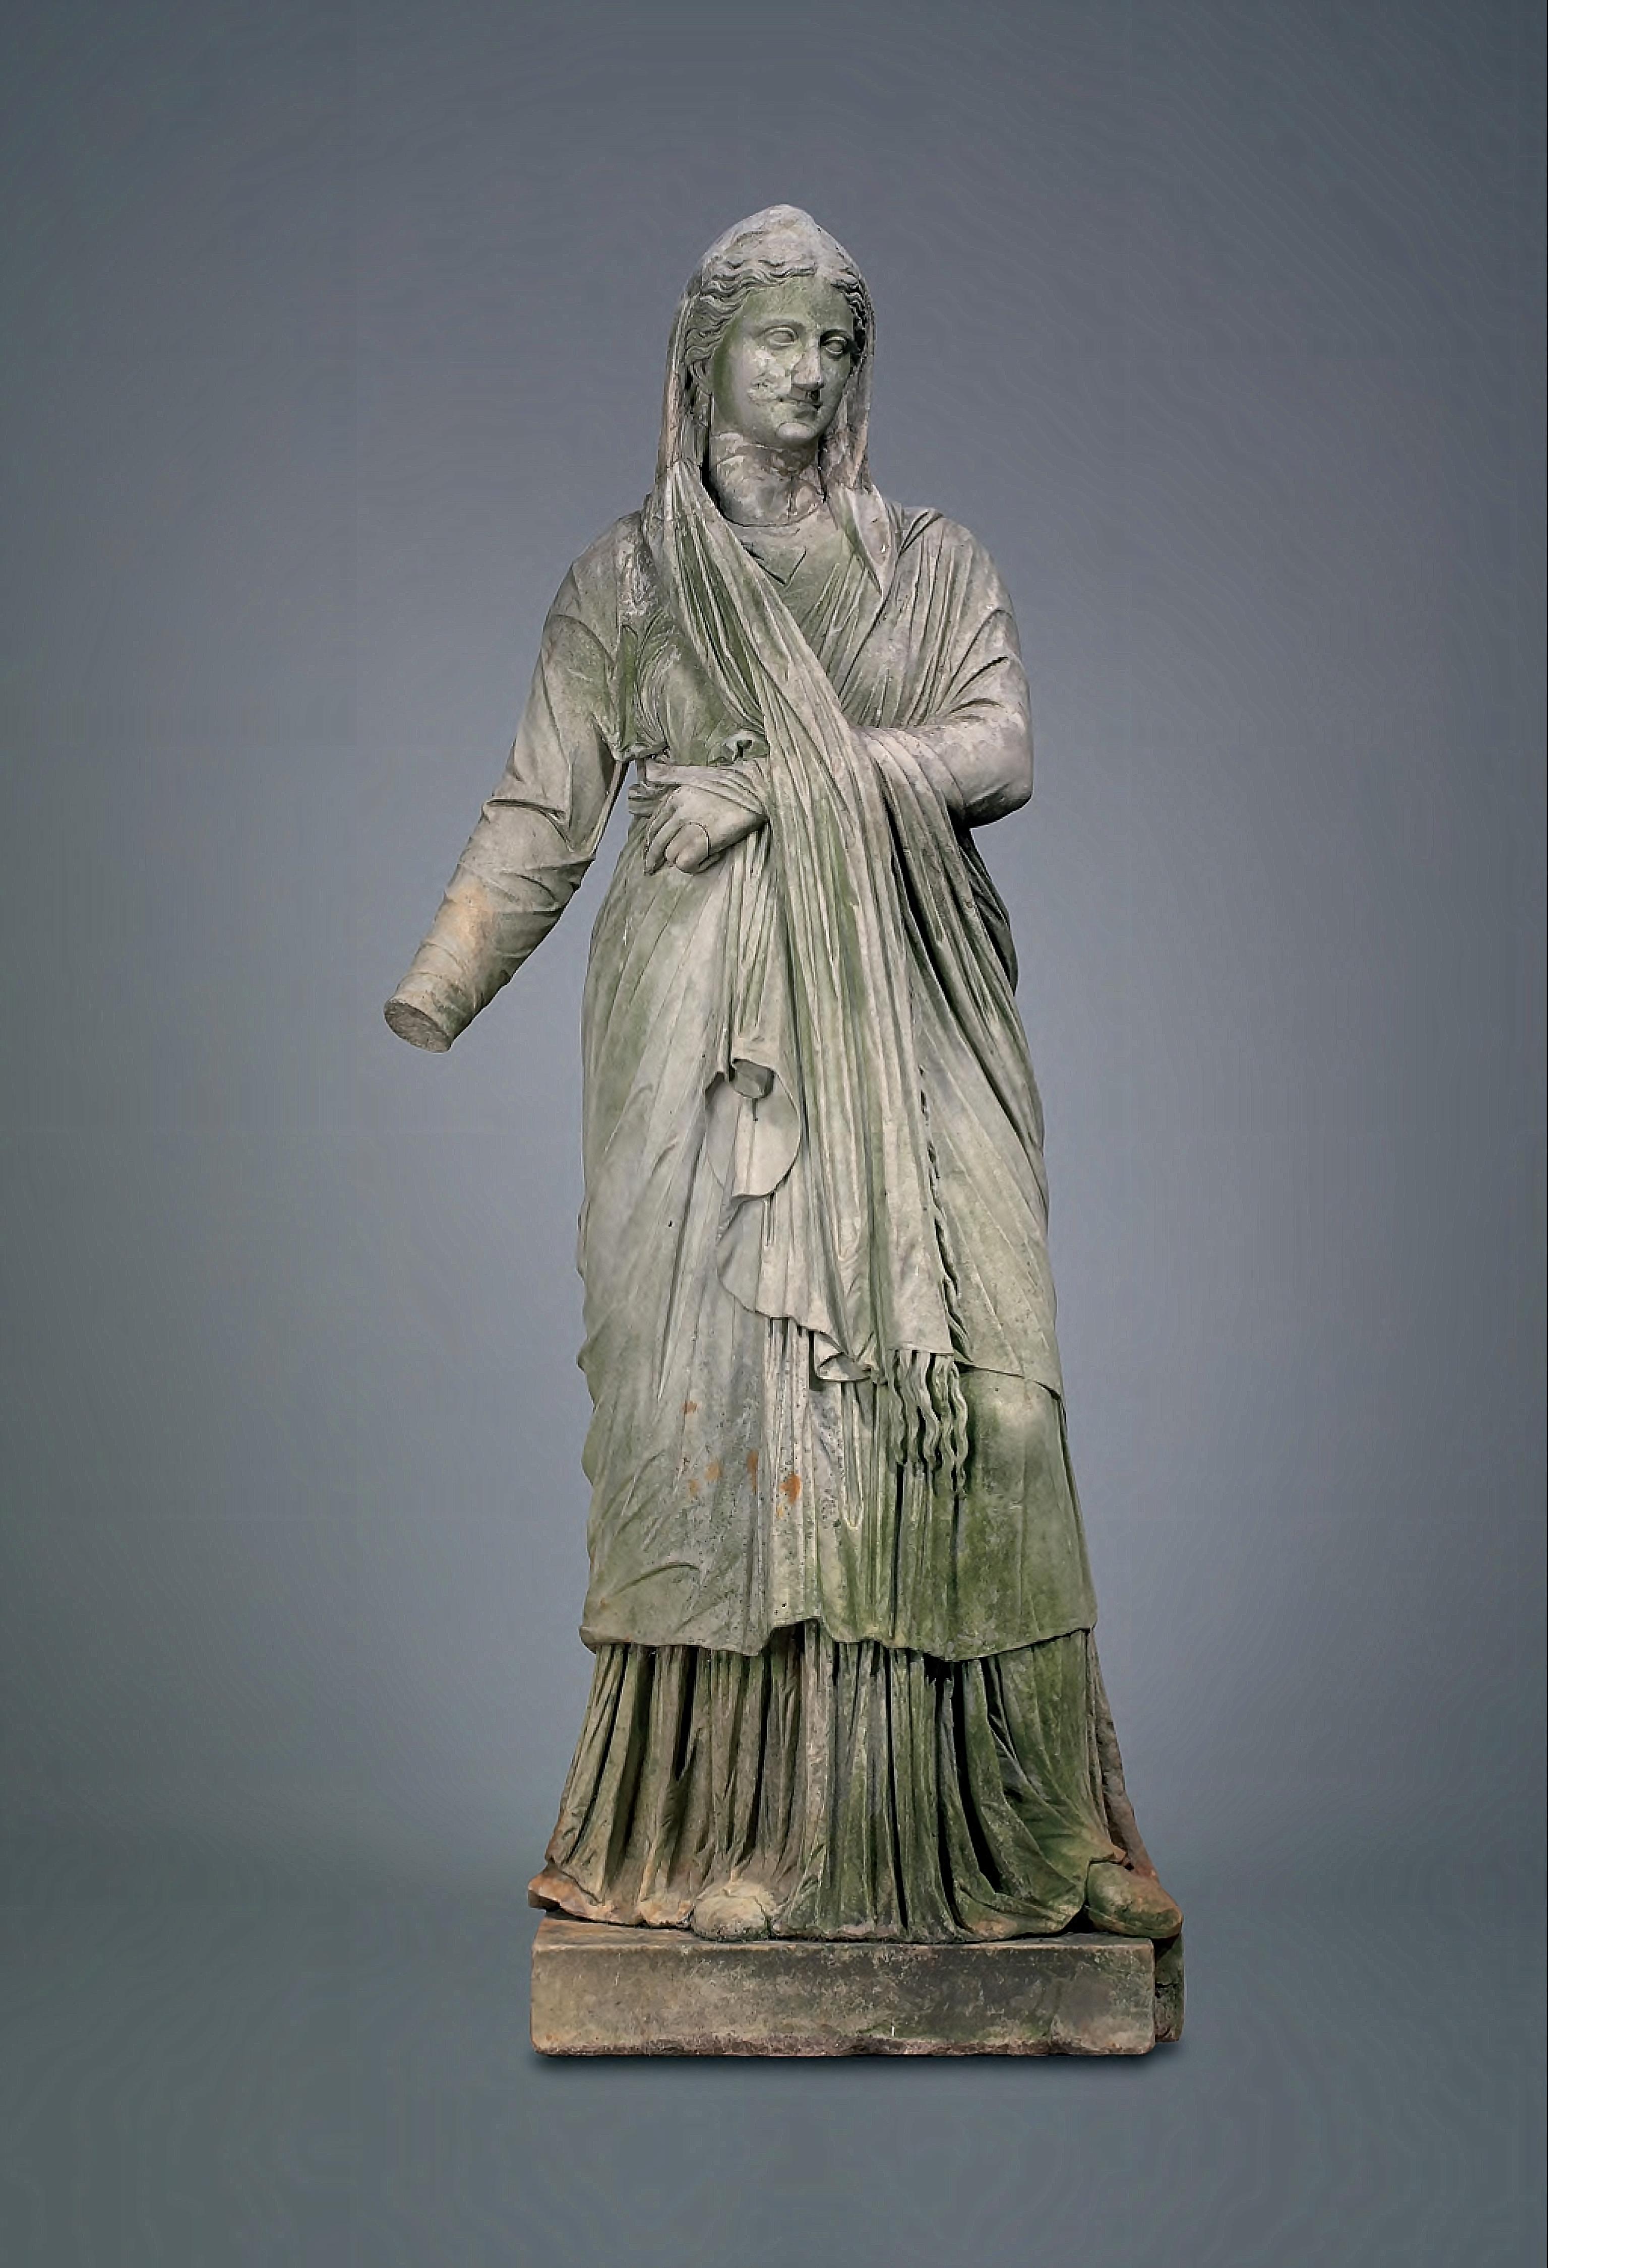 Figure_of_a_Woman_Roman_1st_century_BC_early1st_century_AD_Marble_YaleUniversityArtGallery1